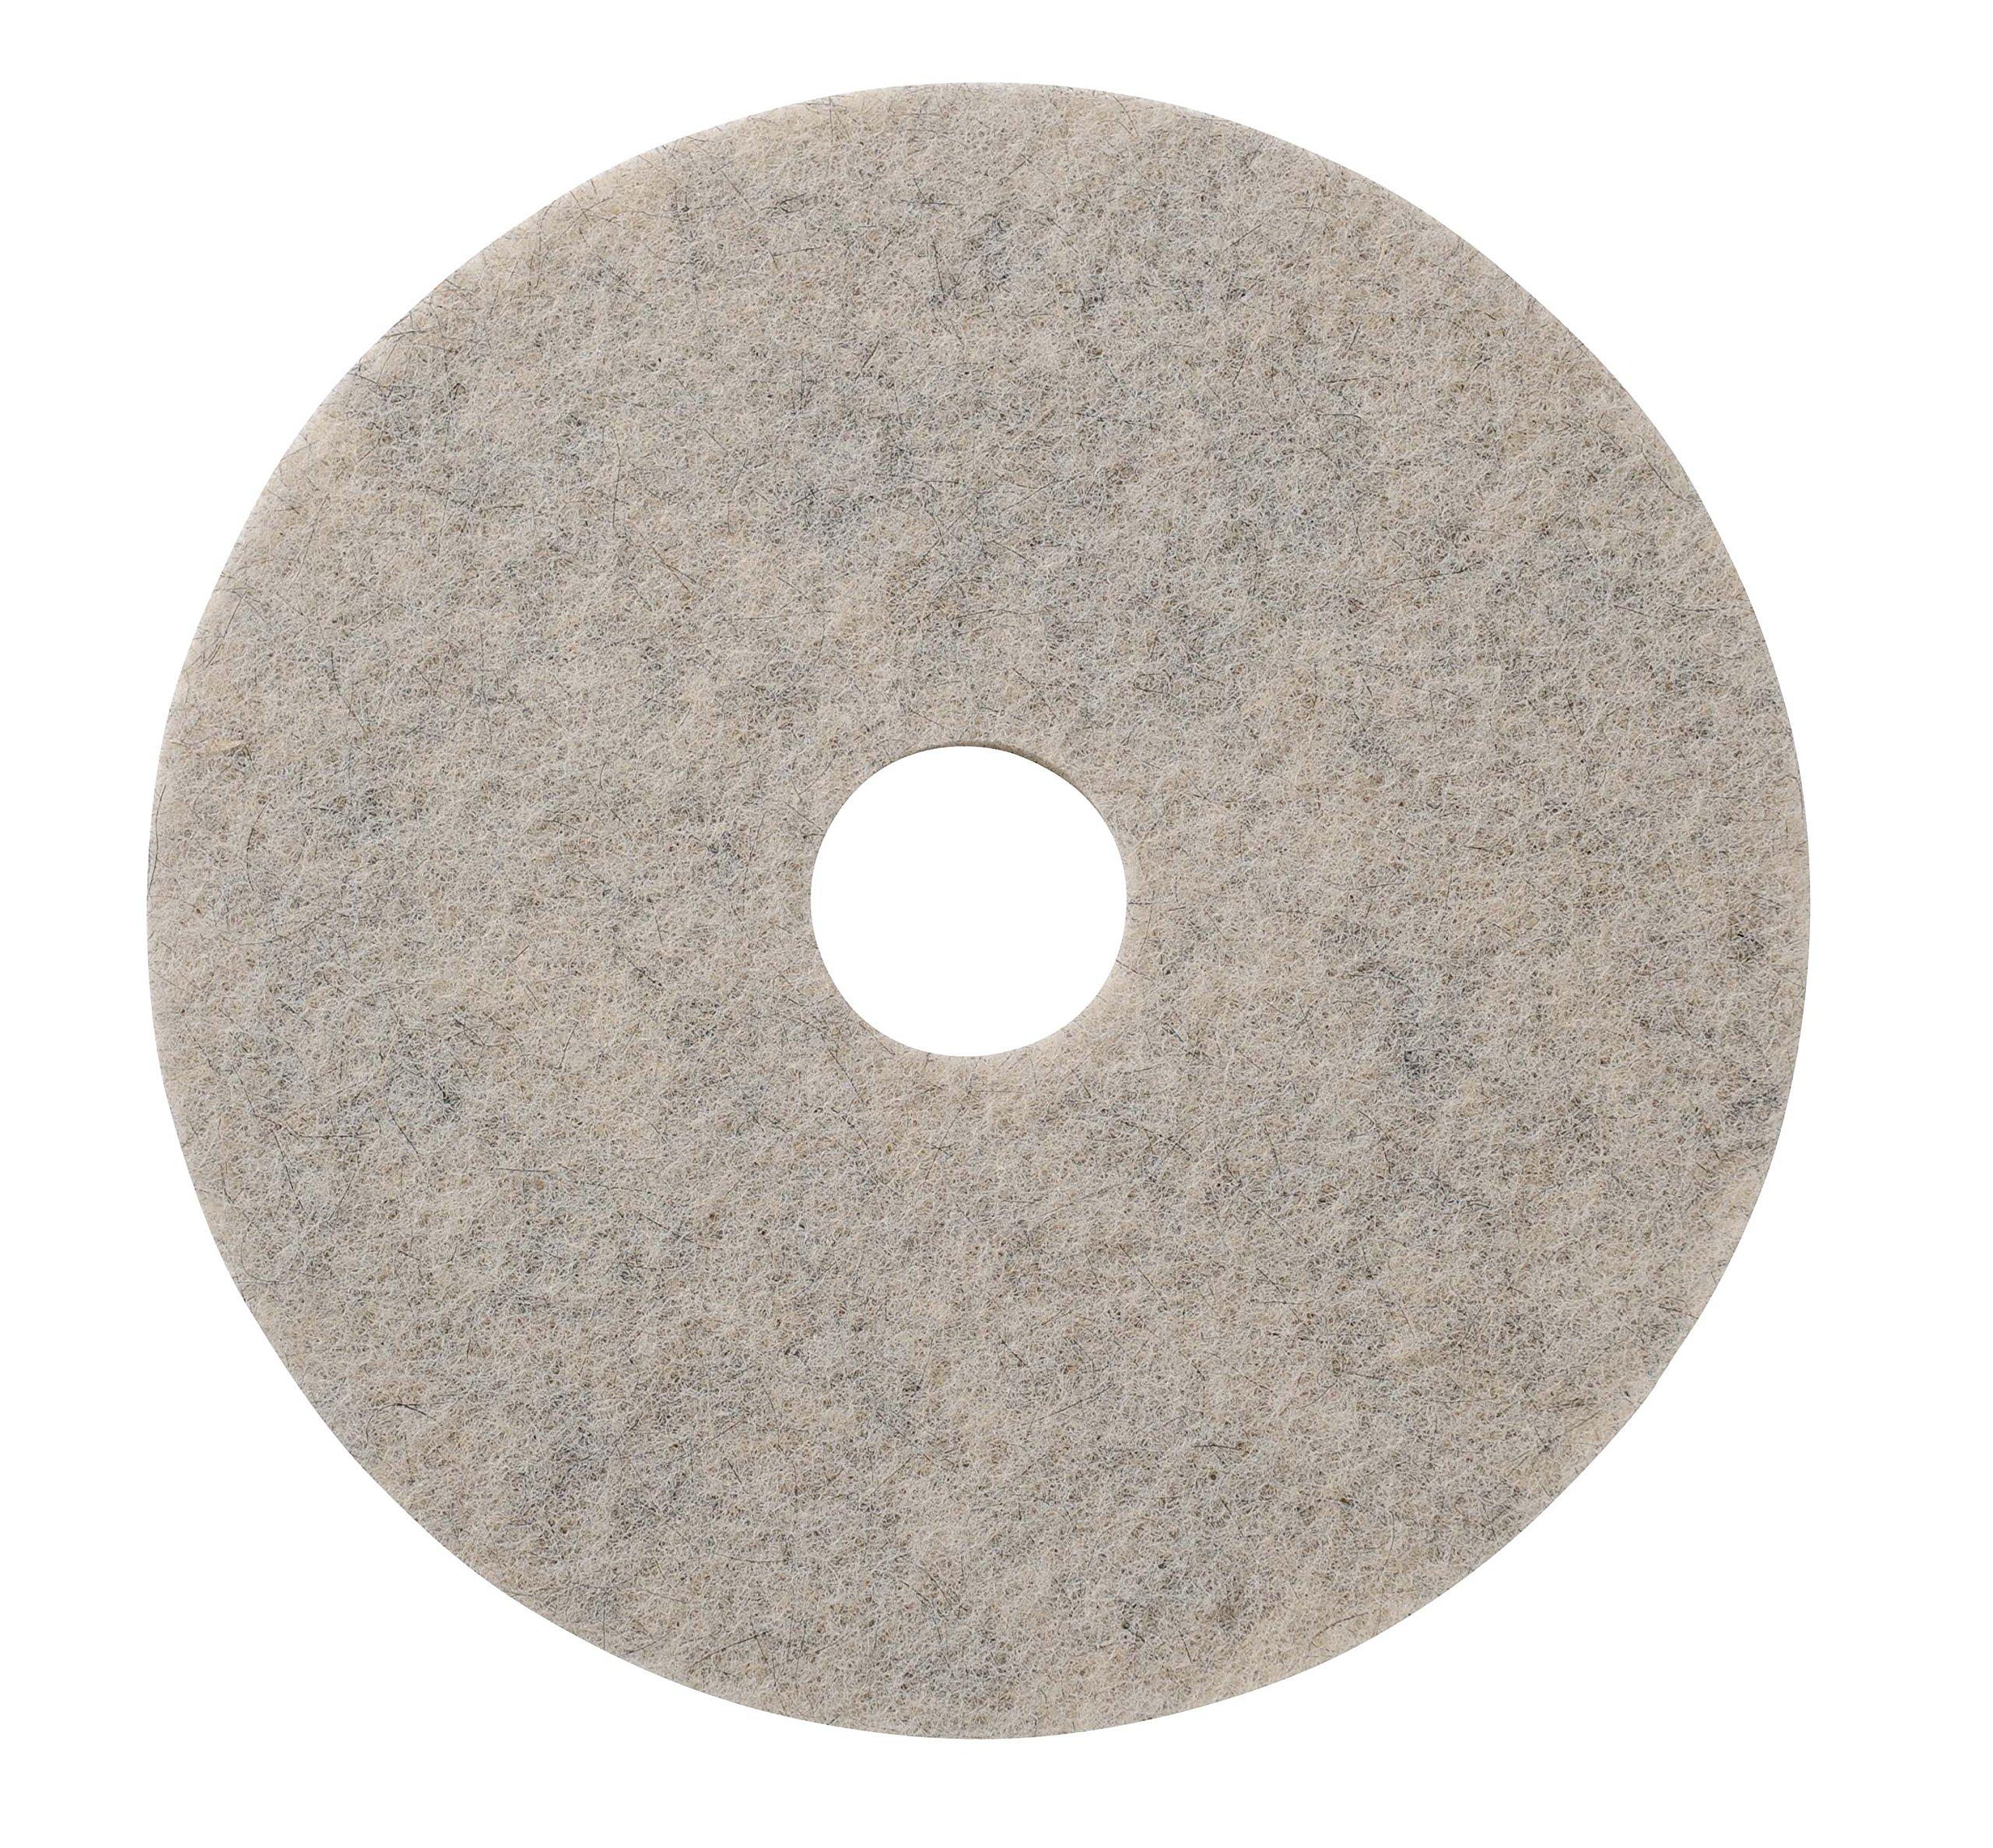 Glit/Microtron 402056 Jackaroo Lite Soft to Medium Finish Burnishing Pad, Natural Fiber, 27'', White/Black (Pack of 5) by Glit / Microtron